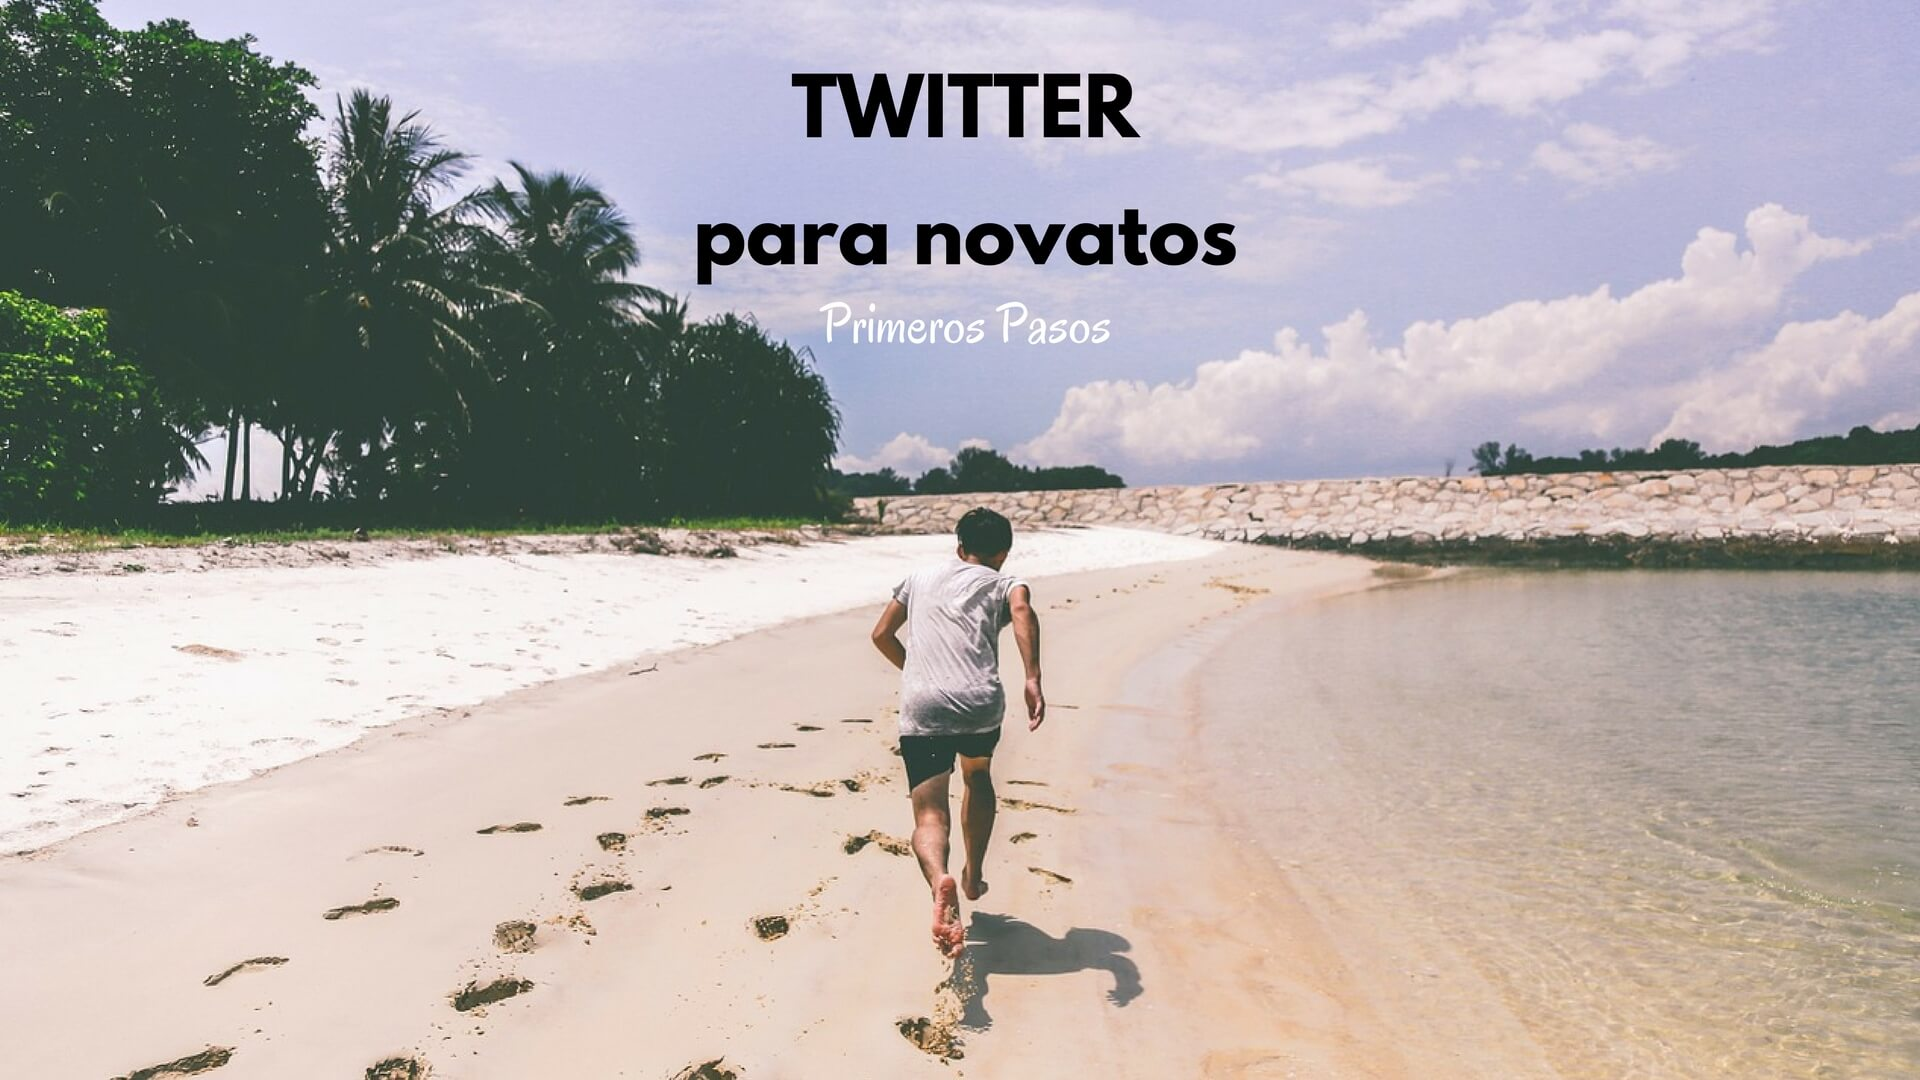 Twitter para novatos. Cómo utilizar Twitter paso a paso